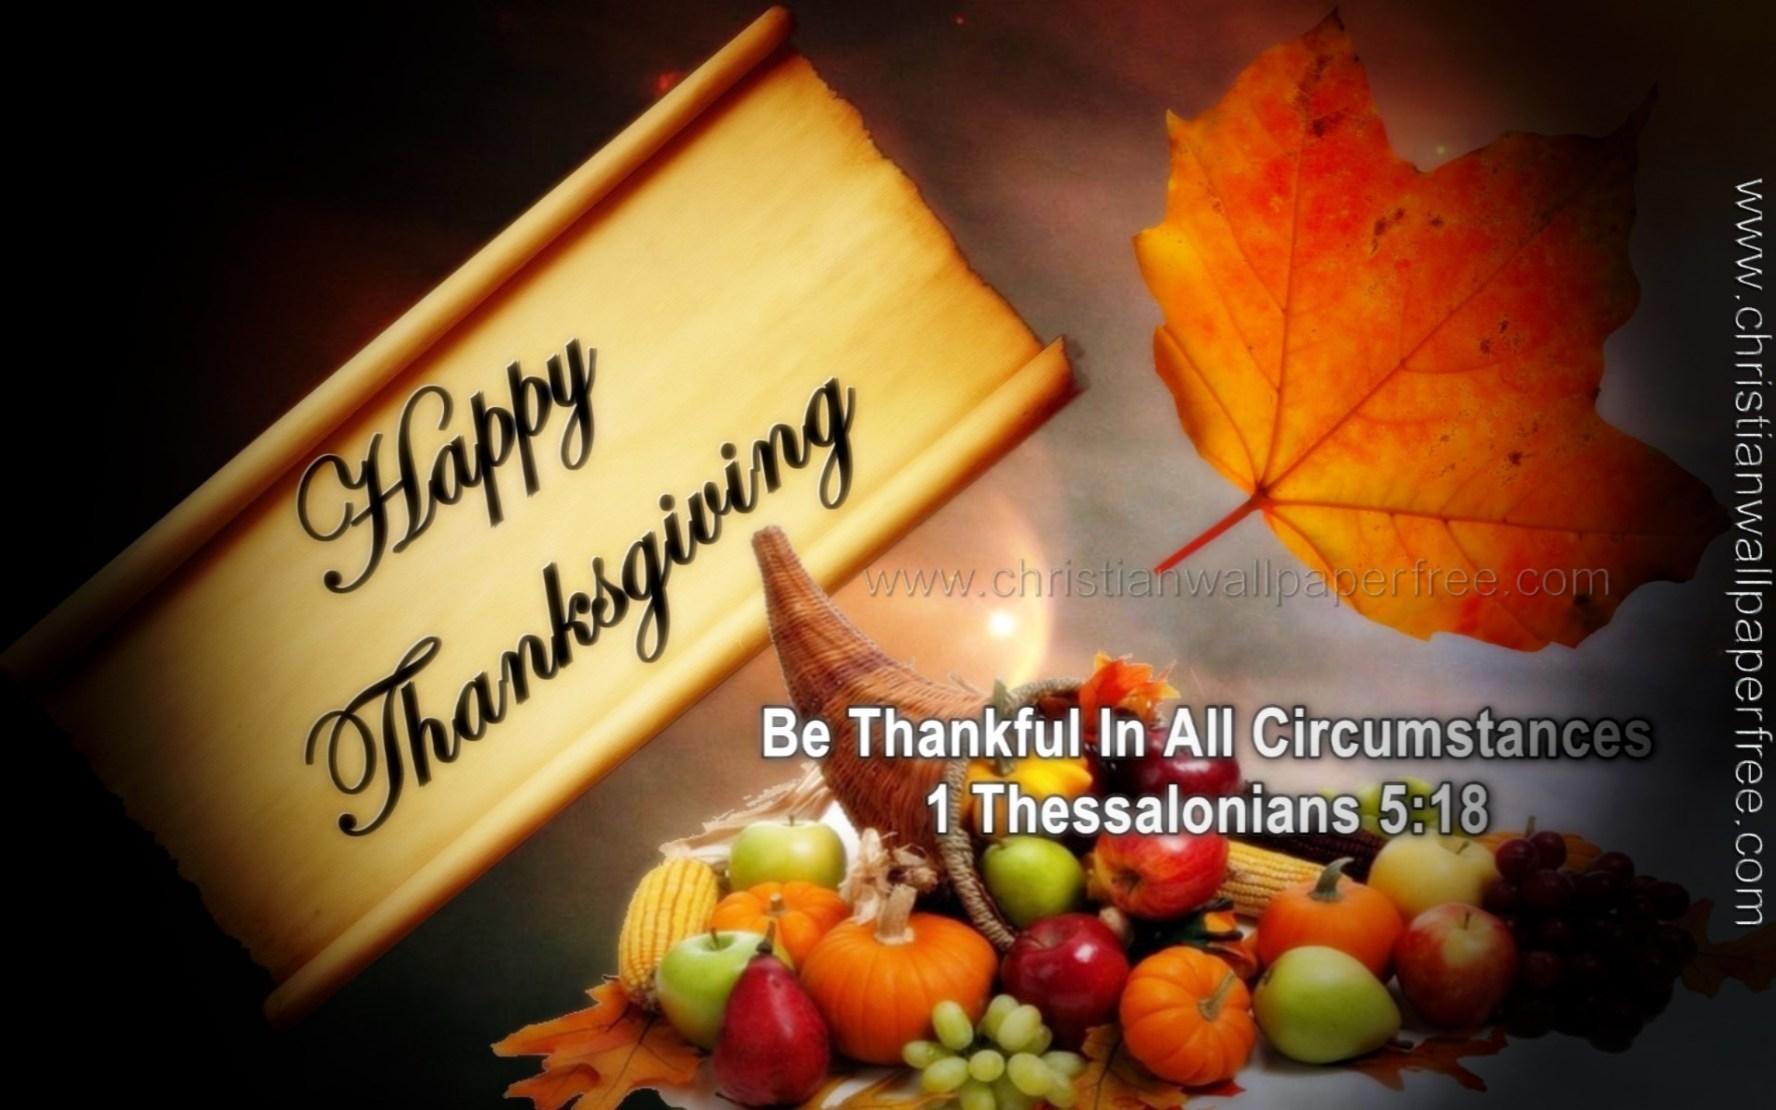 Thanksgiving 1 Thessalonians 5 Verse 18 Christian Wallpaper Free